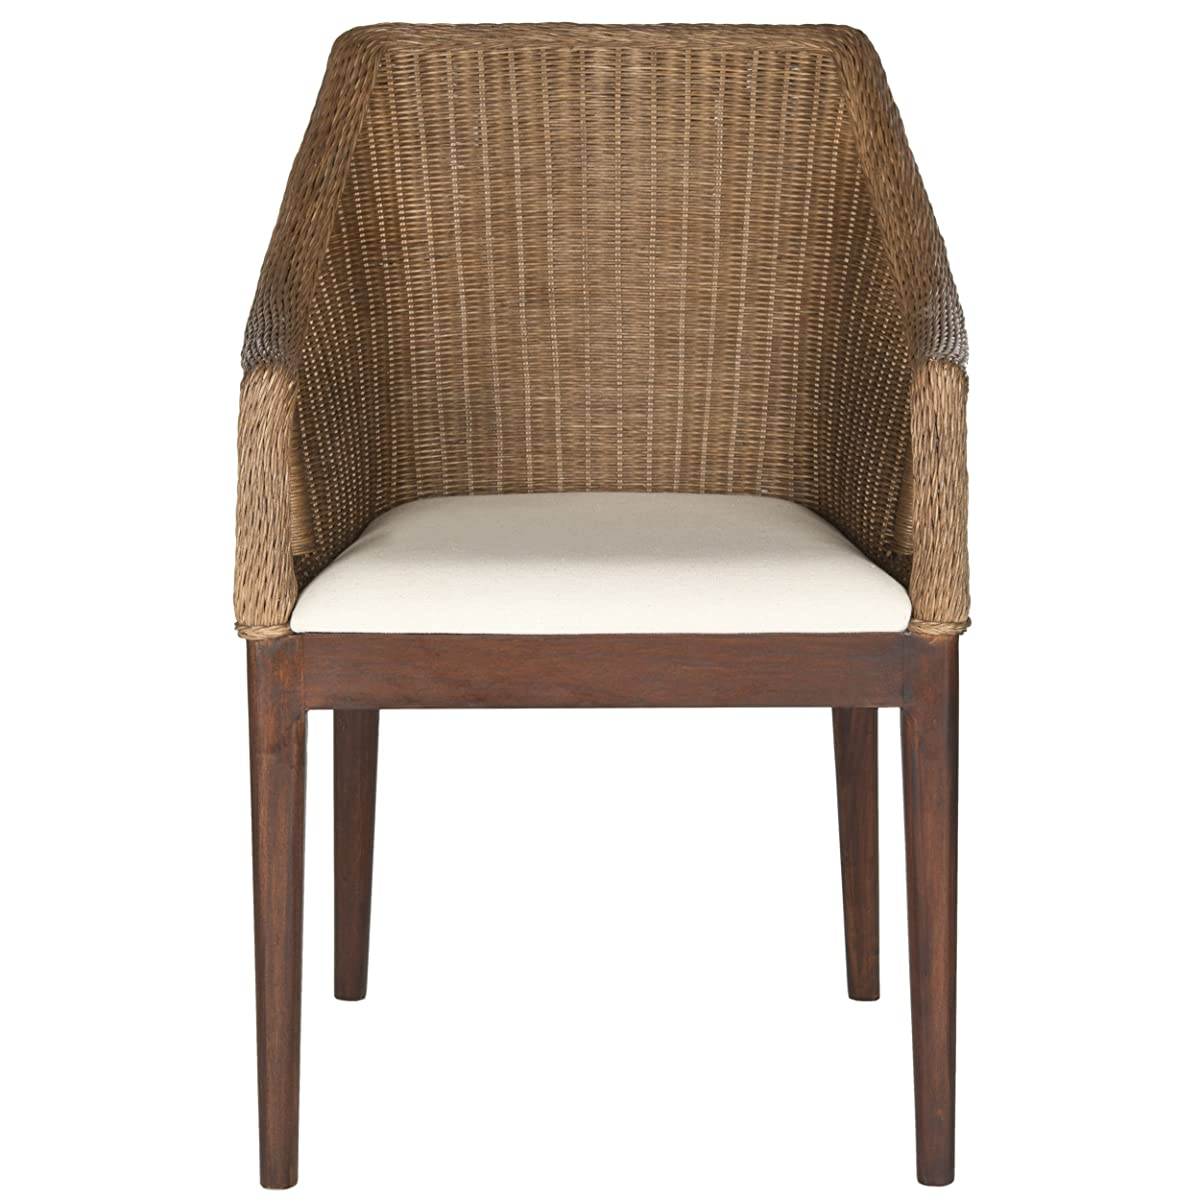 Safavieh Home Collection Enrico Arm Chair, Brown